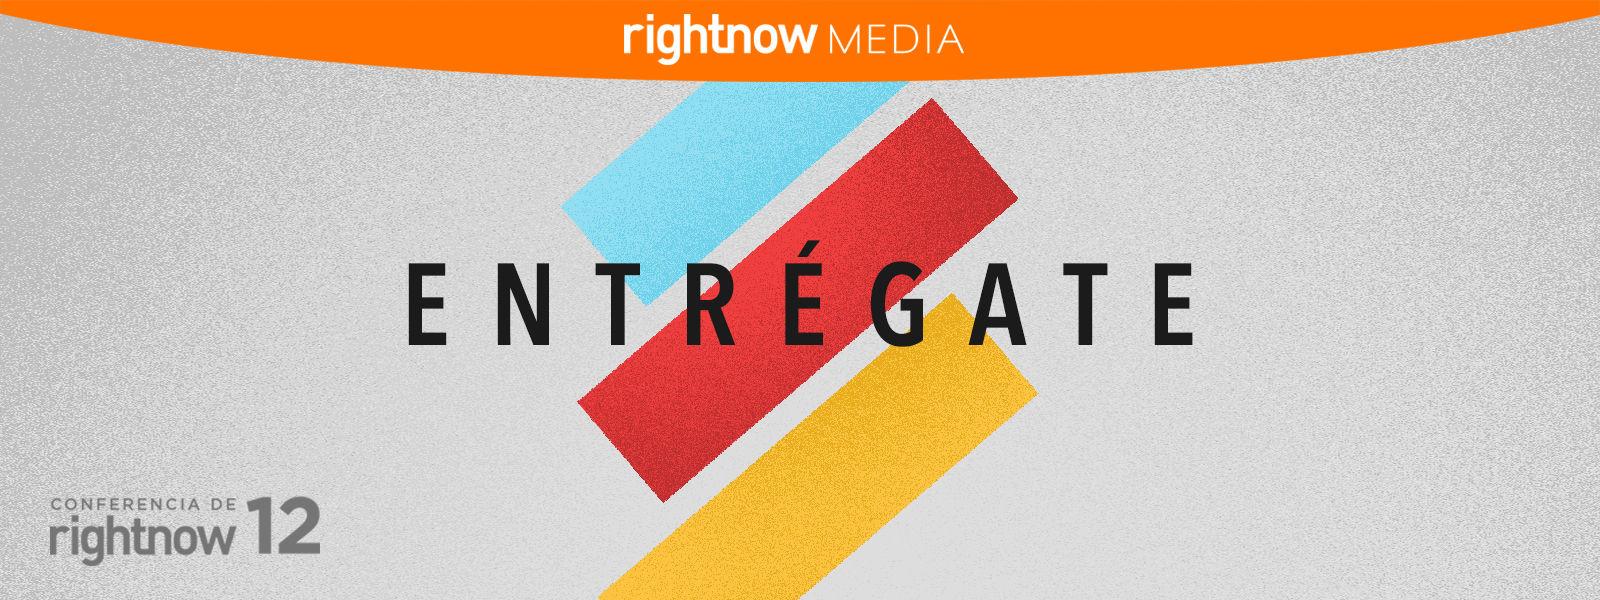 ENTRÉGATE conferencia de RightNow